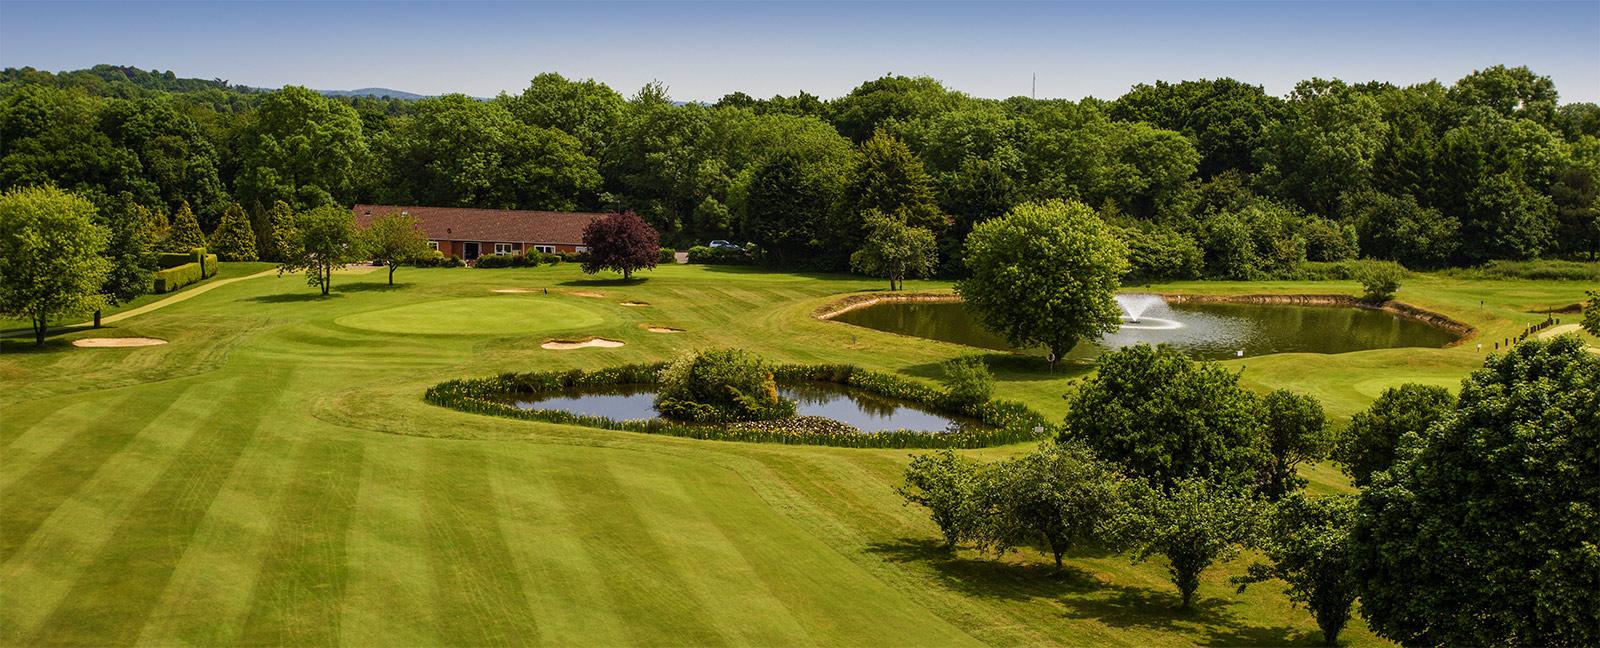 35+ Berks golf courses information